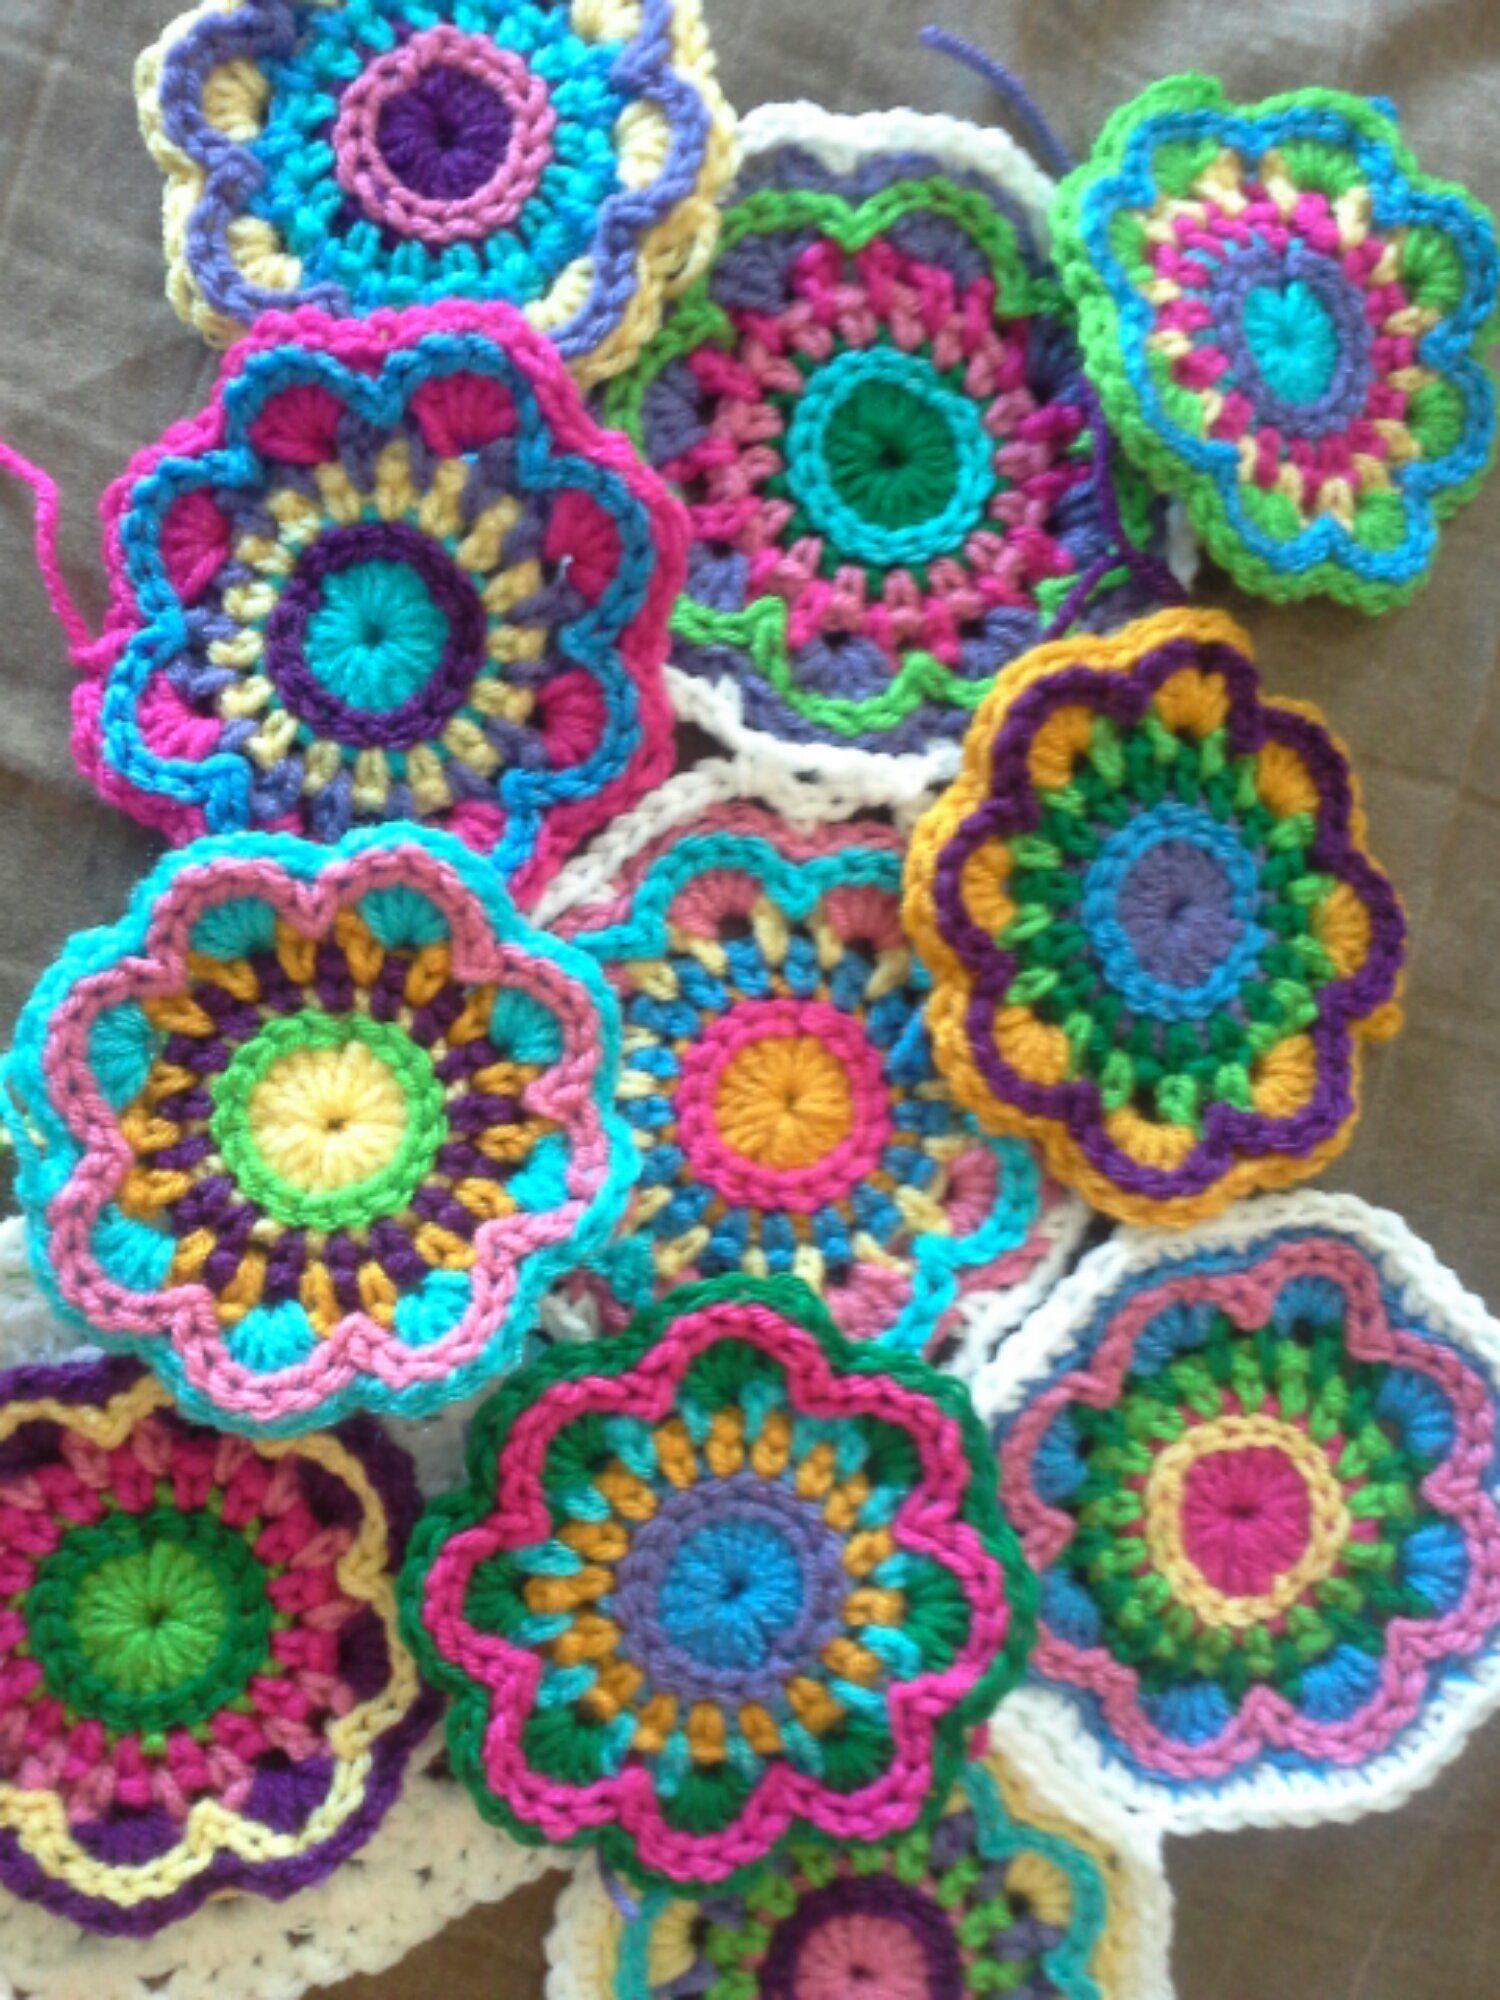 Free Crochet Patterns In South Africa : Bursting Blooms Flower Mandala- free pattern African ...